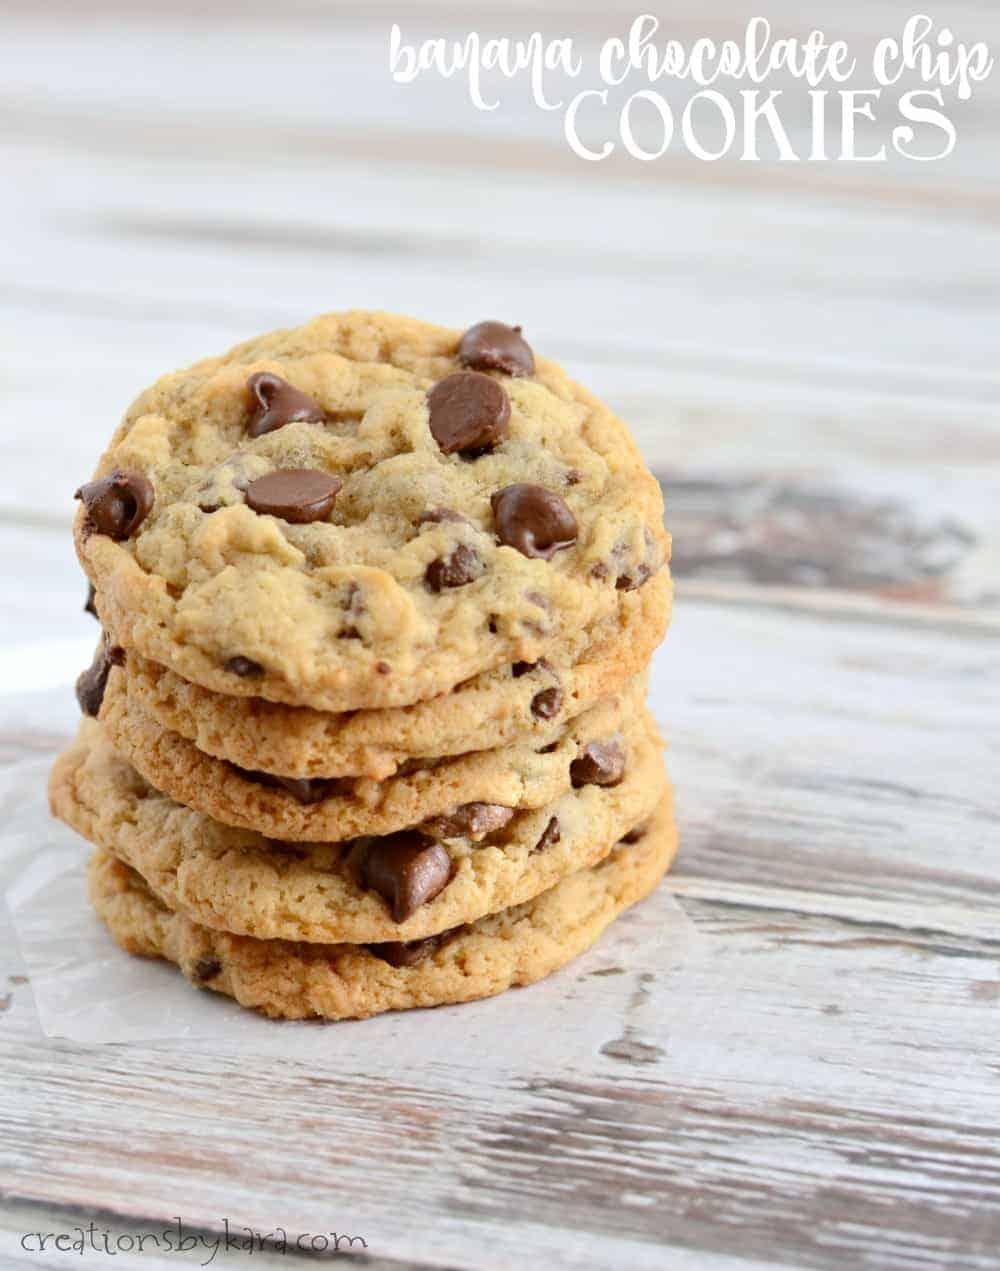 Banana Chocolate Chip Cookies - Creations by Kara